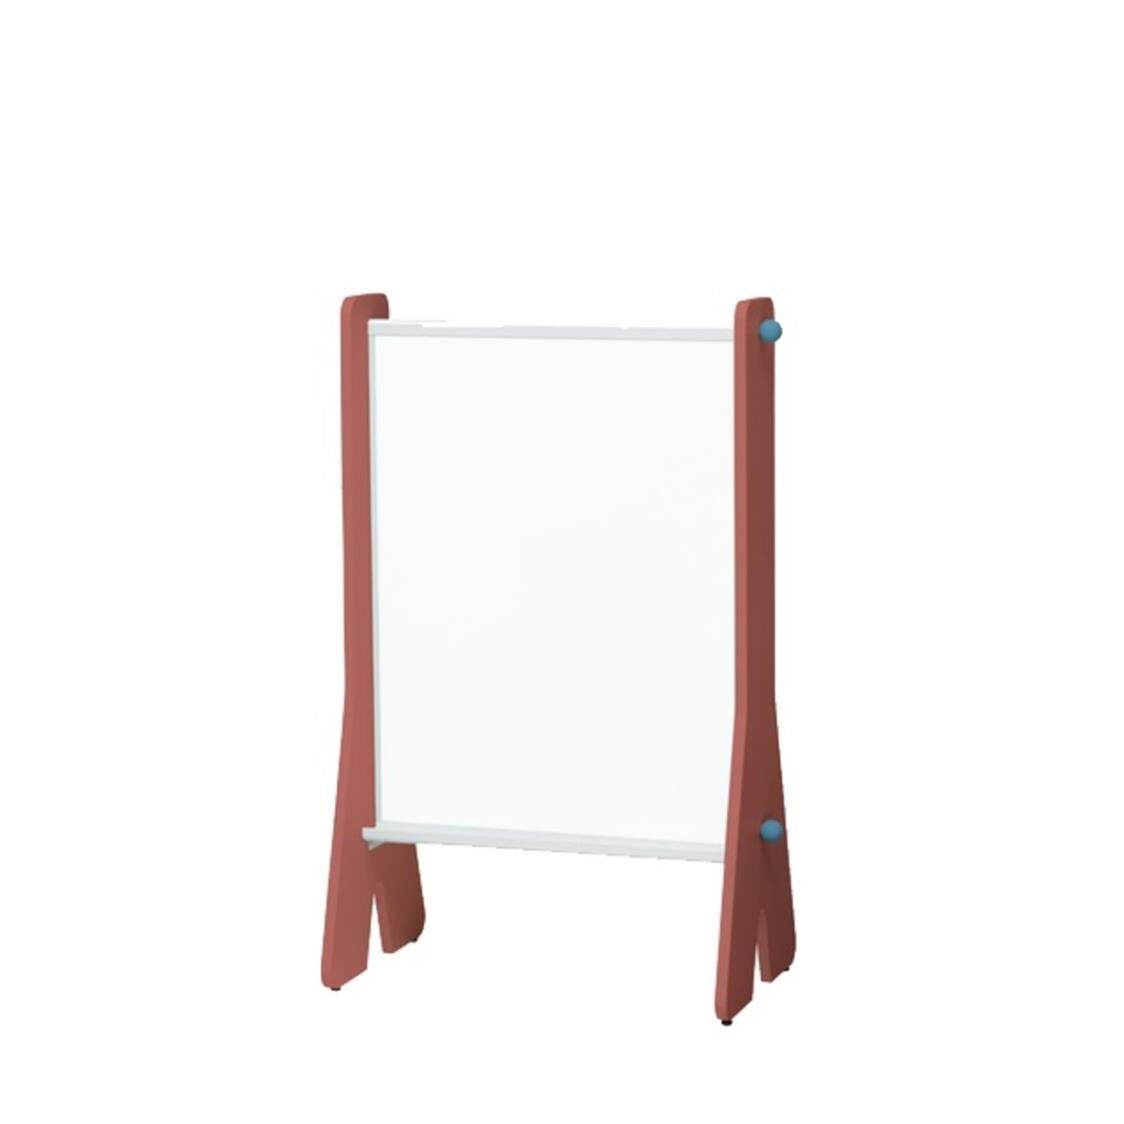 Iloom Tinkle Pop White Board KRKS Red Sky Blue